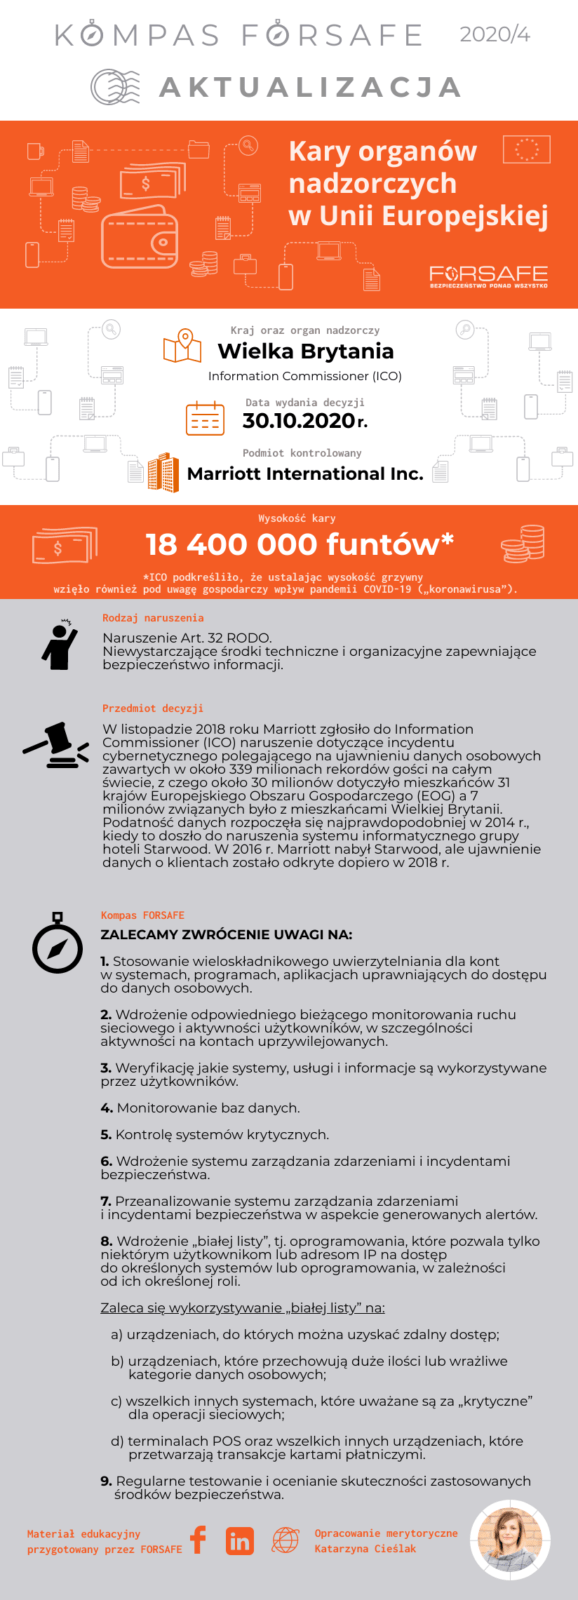 kompas forsafe eu 2020 4 aktualizacja KOMPAS FORSAFE EU 2020/4 - Kara dla Marriott - aktualizacja